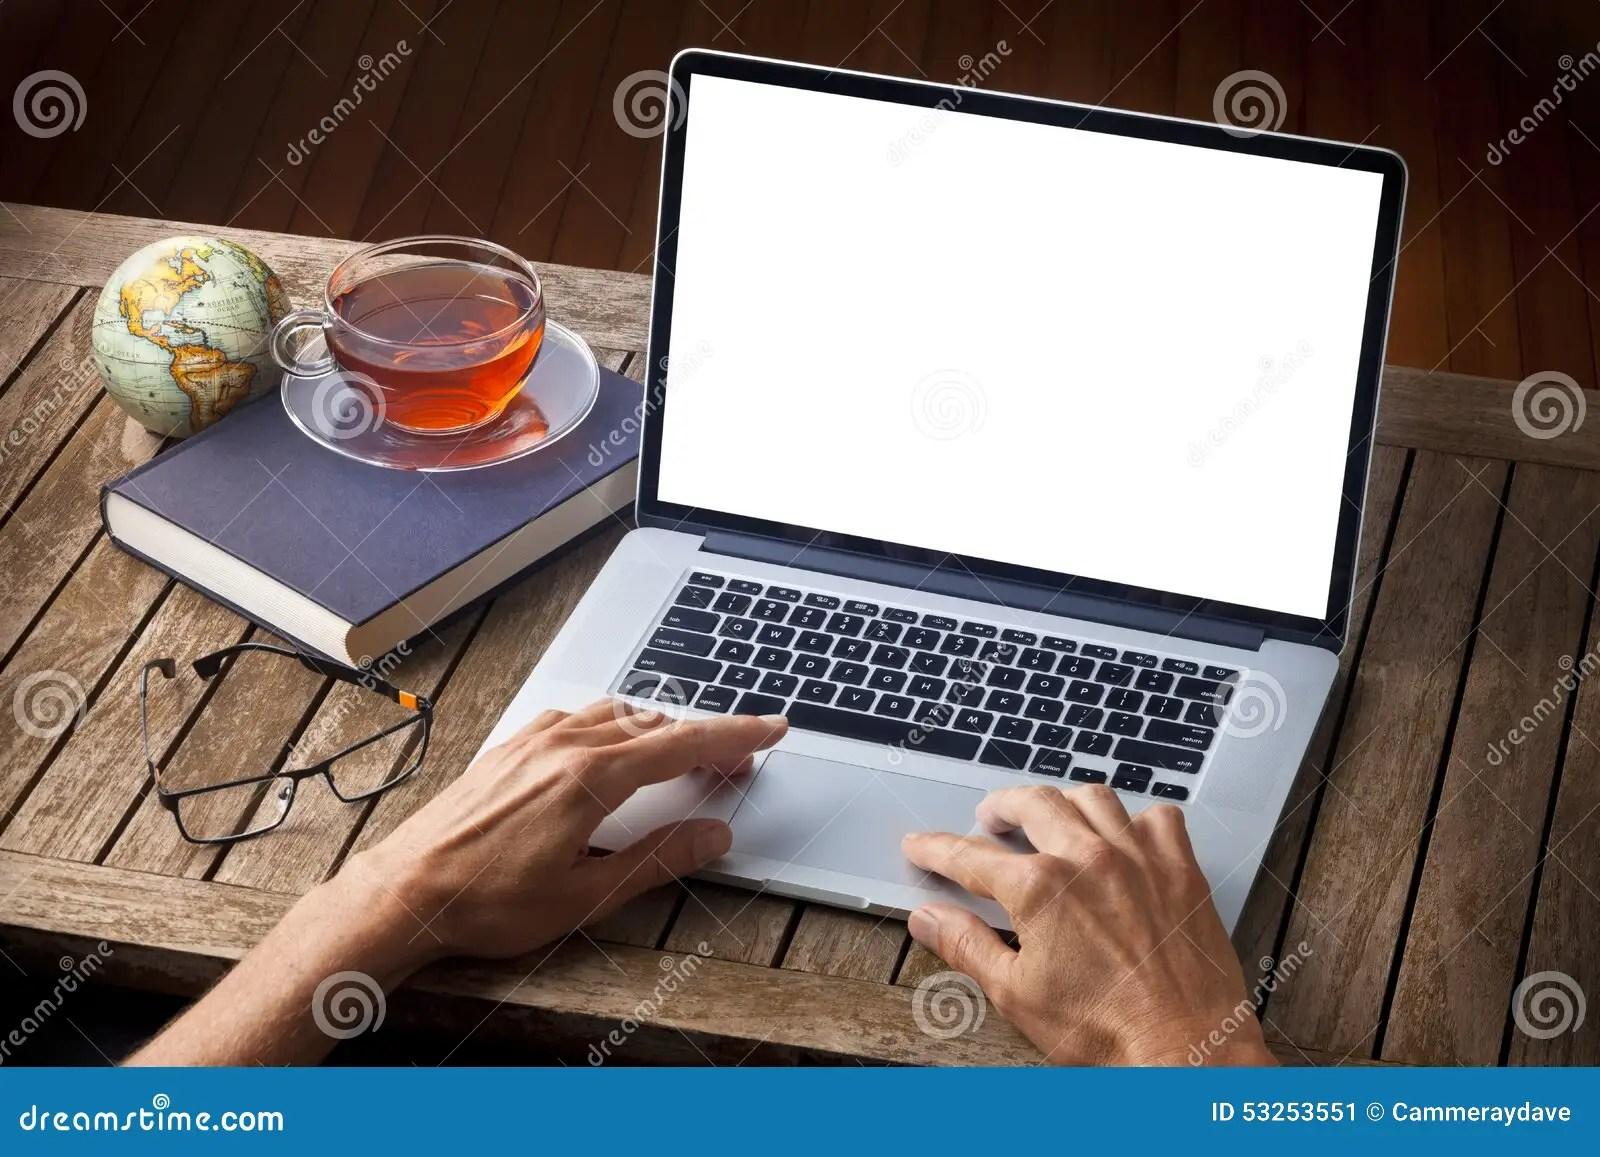 Hands Laptop Computer Desk Stock Photo  Image 53253551